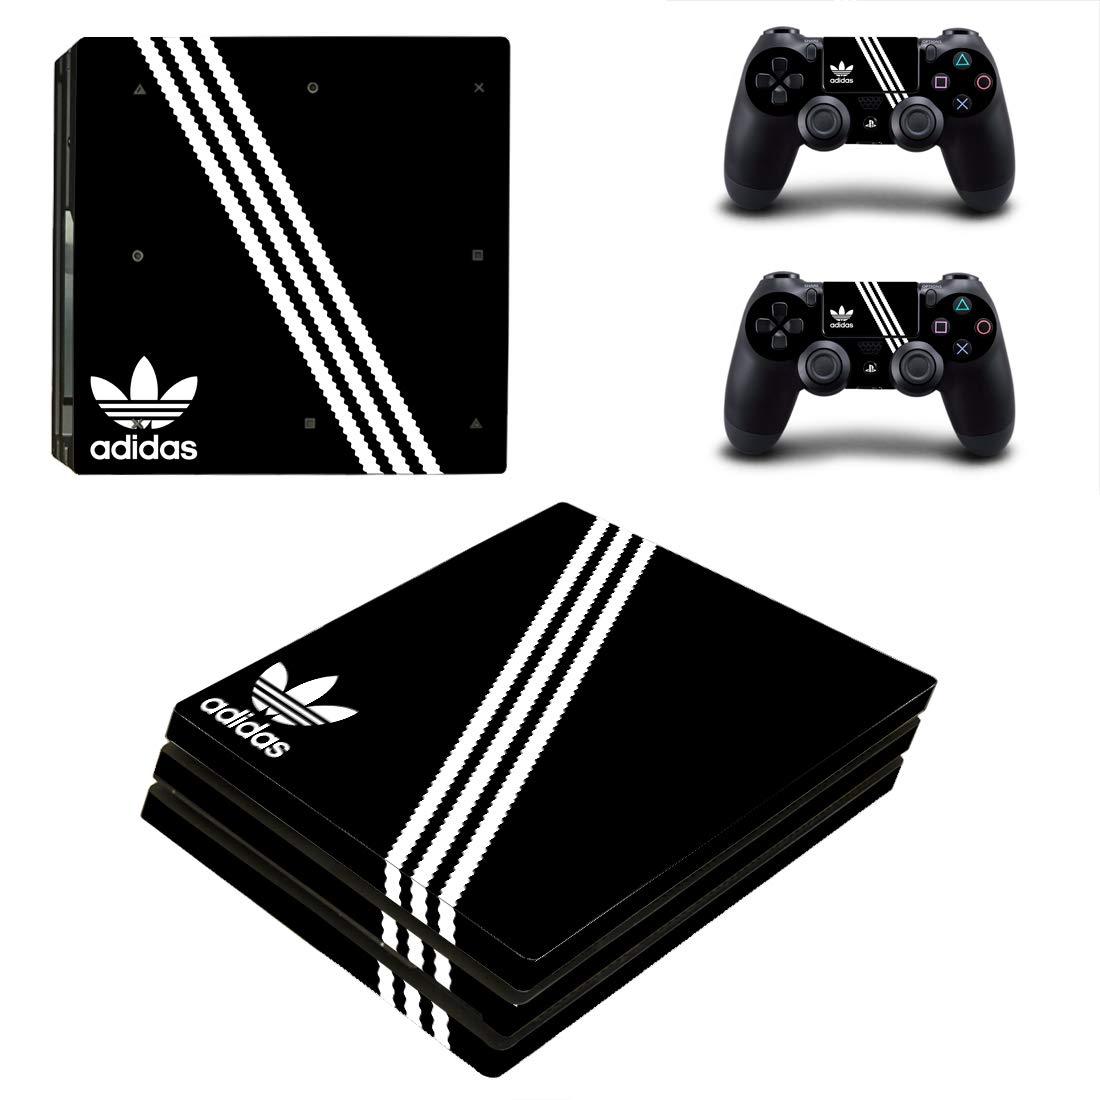 Adventure Games PS4 PRO - Adidas, Black - Playstation 4 Vinyl Console Skin Decal Sticker + 2 Controller Skins Set